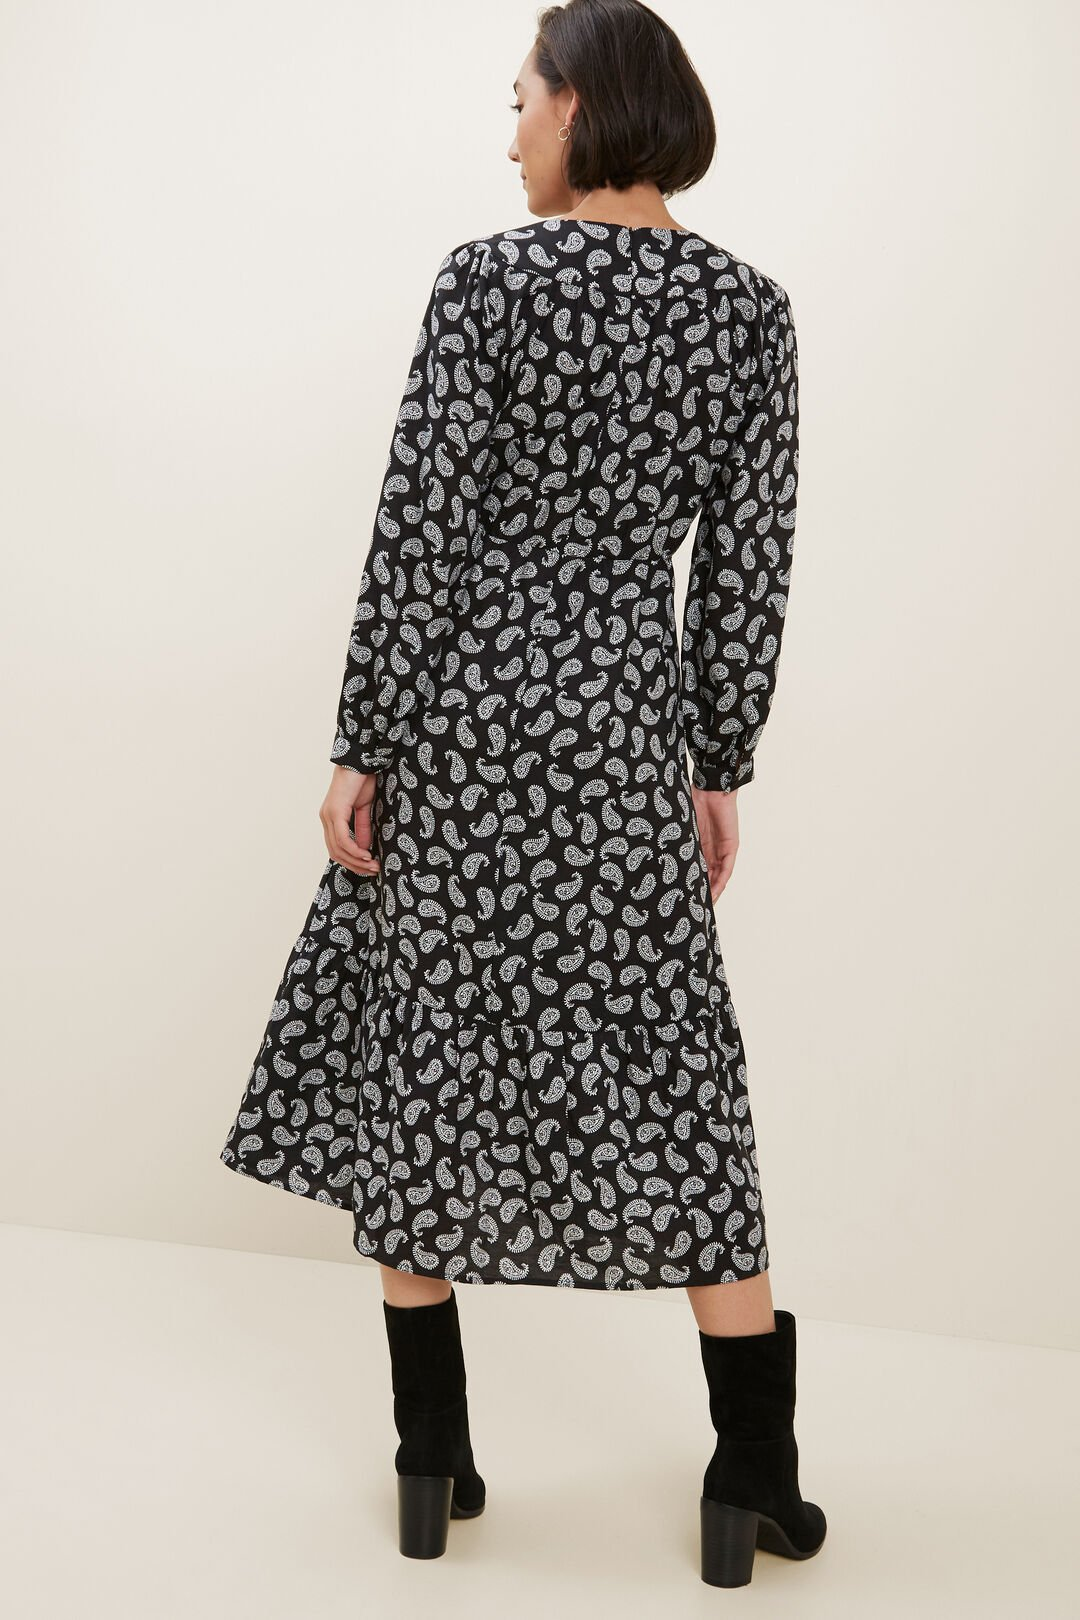 Paisley Midi Dress   MONO PAISLEY  hi-res